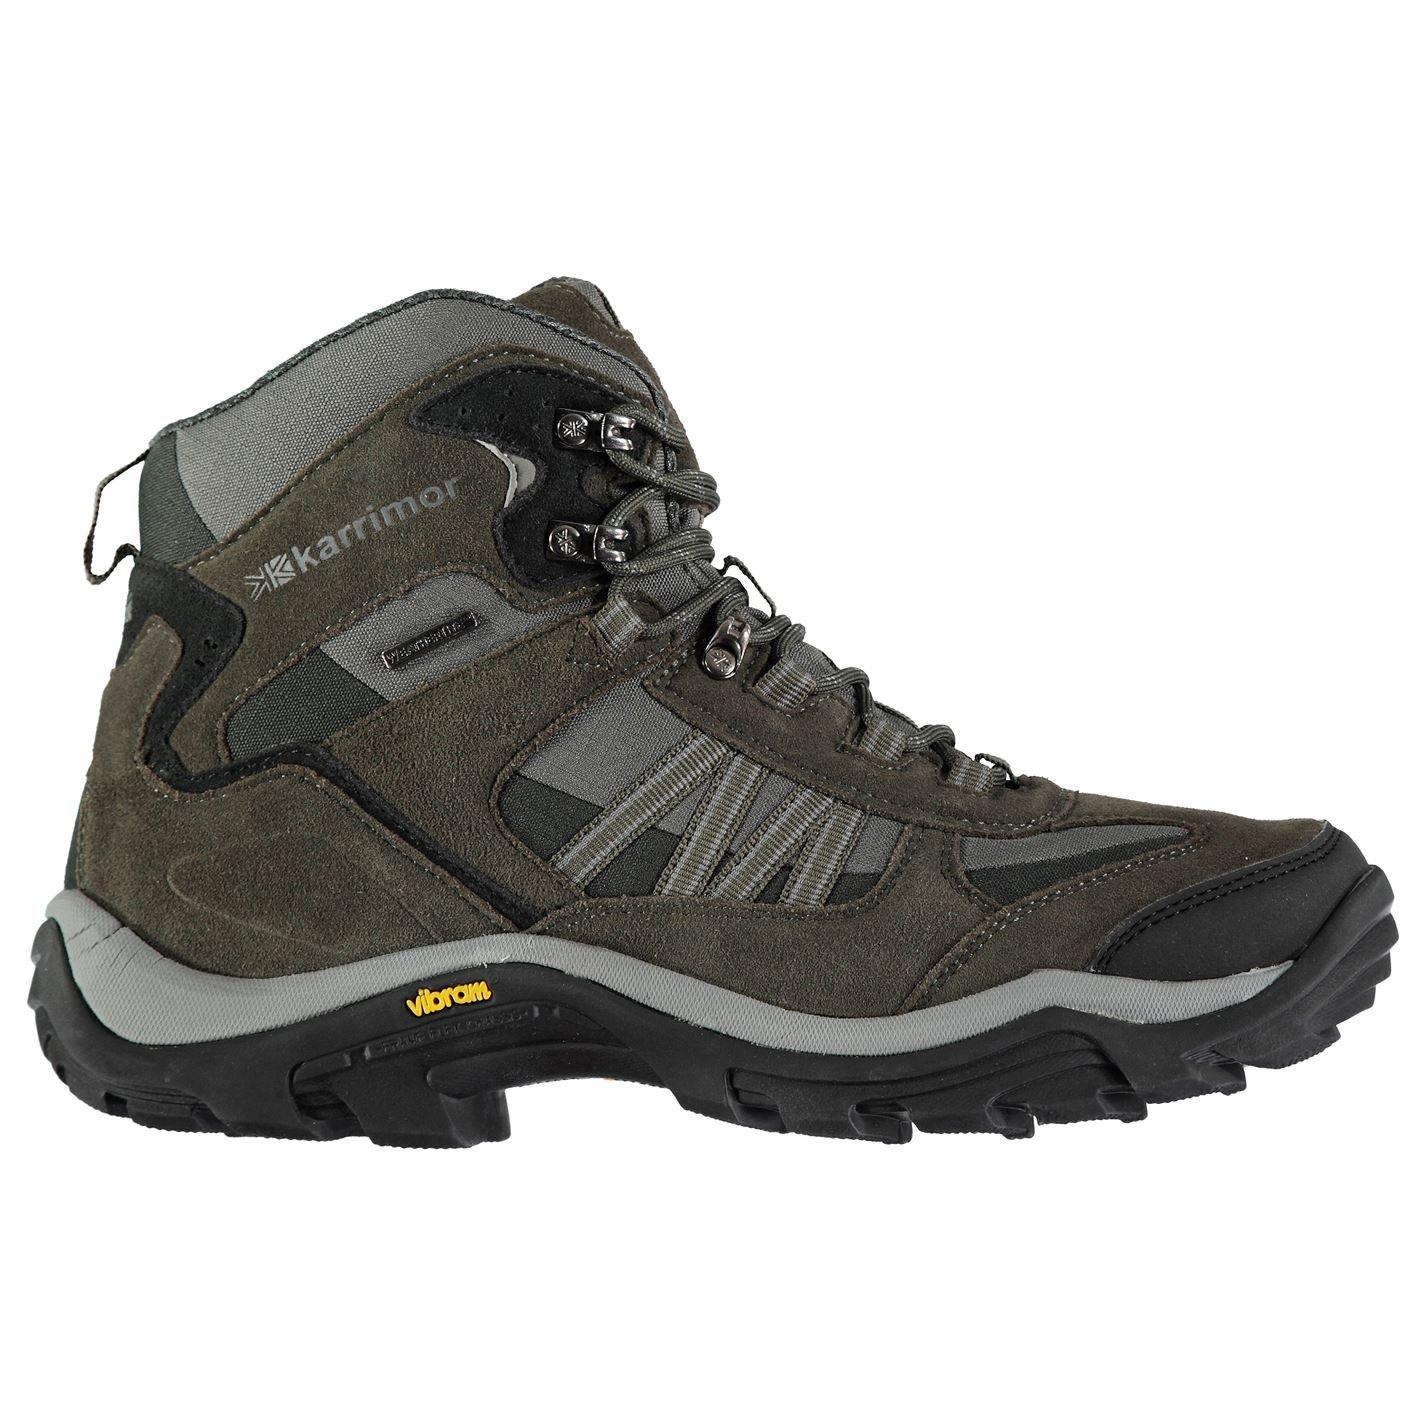 Karrimor Mens Aspen Mid Weathertite Walking Boots Waterproof Breathable Shoes Black Sea UK 8.5 (42.5)